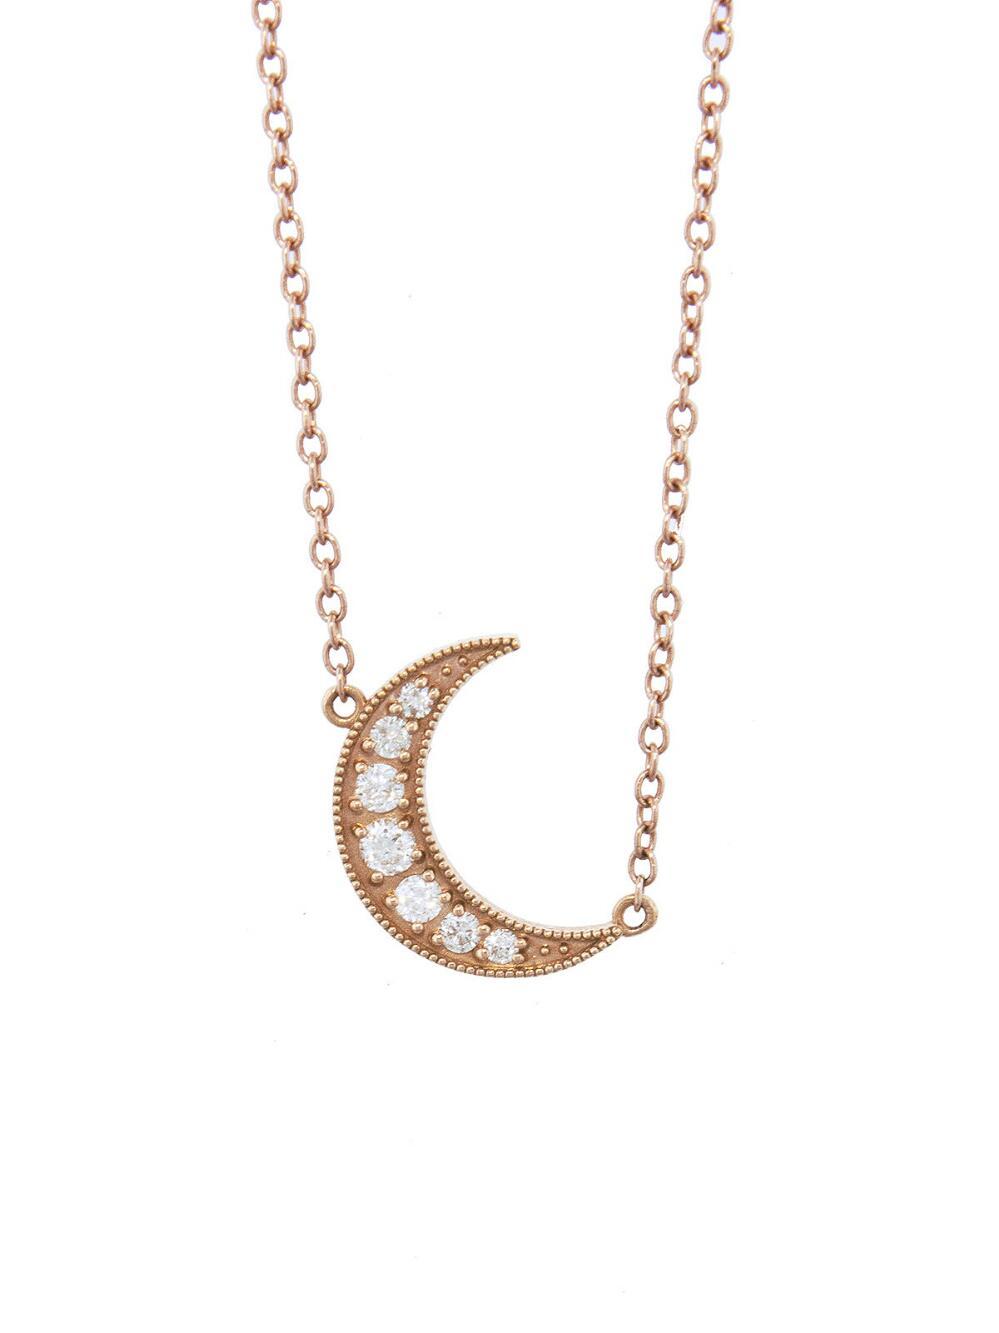 Celestial Crescent Enamel Necklace Andrea Fohrman Du00X